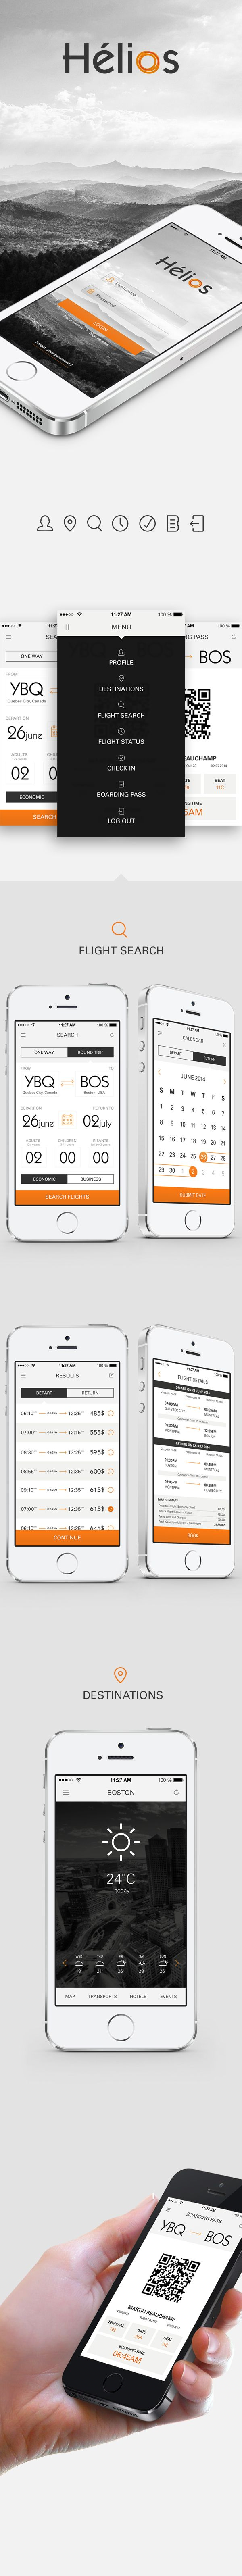 Hélios - Airline App Design by Sabryna Fredette, via Behance